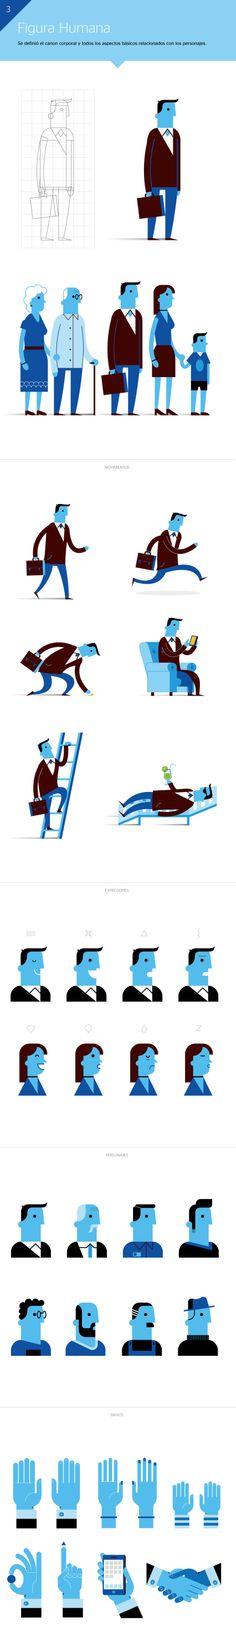 BBVA Ilustración Corporativa. 6